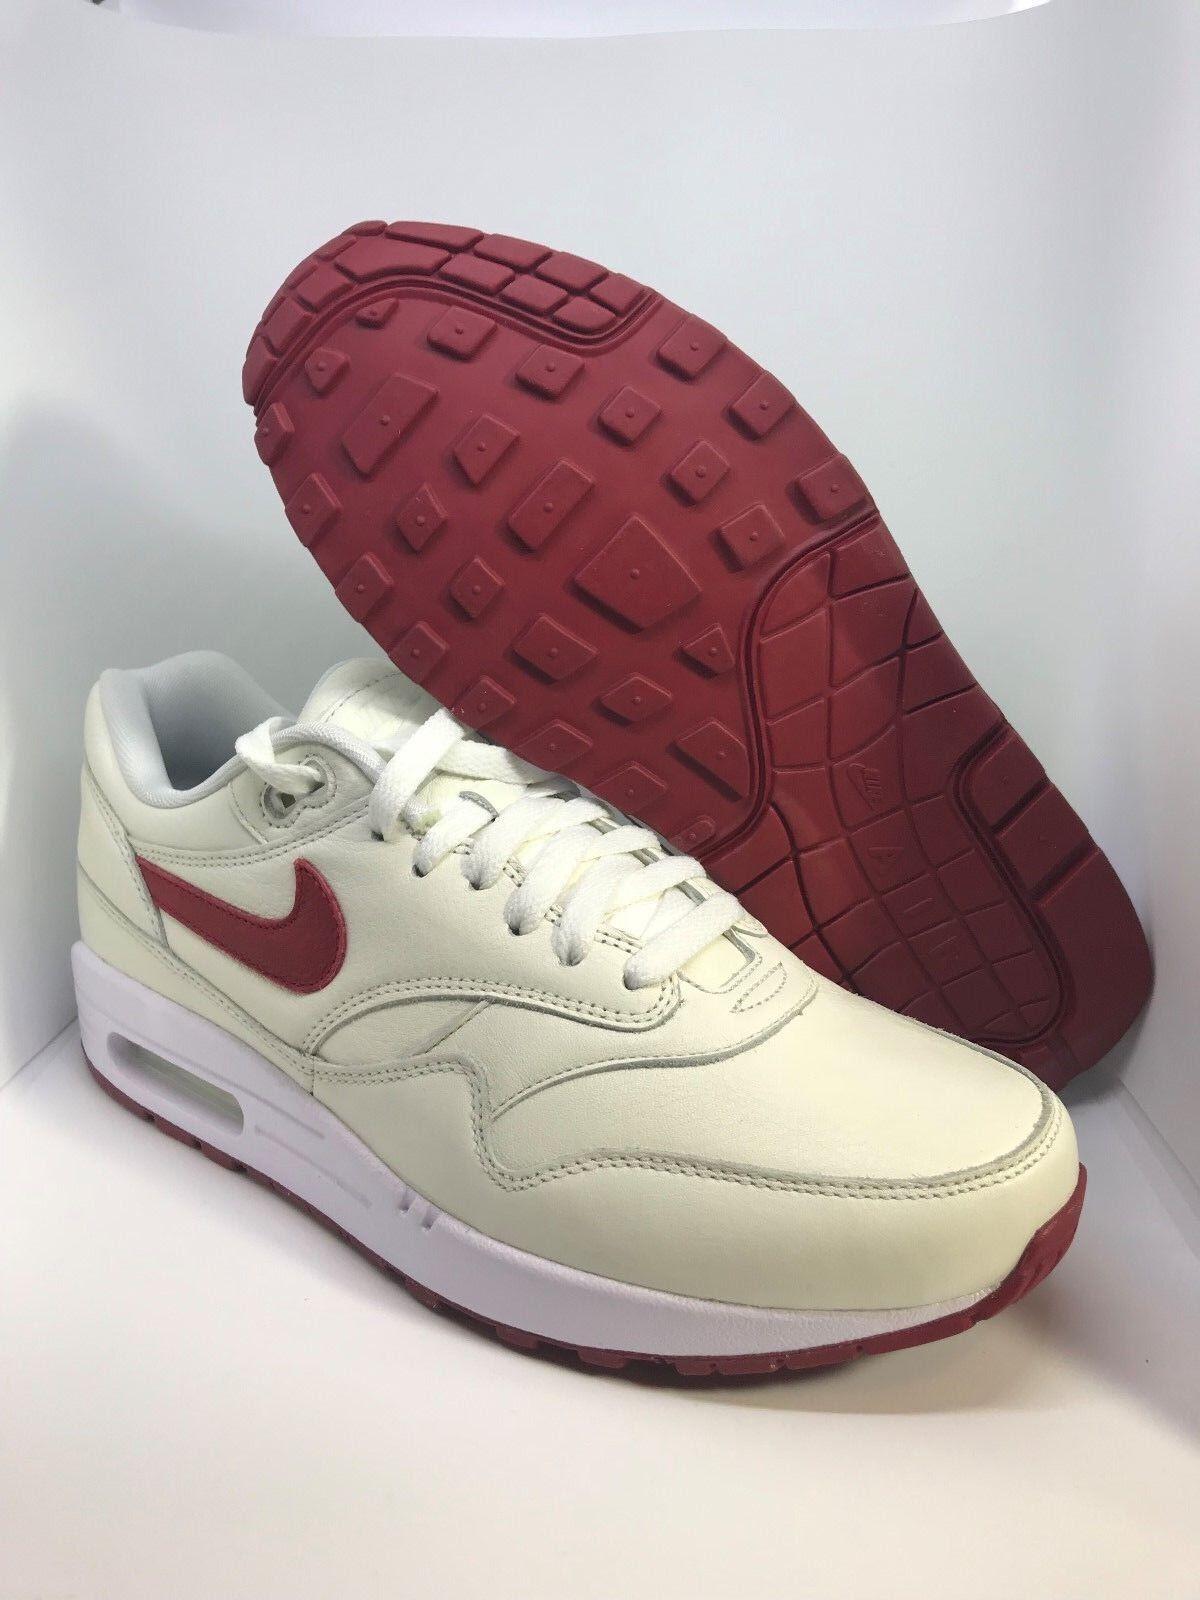 Nike iD Air Max 1 Mens Shoes Alabama Crimson Tides Colorway Size 9.5